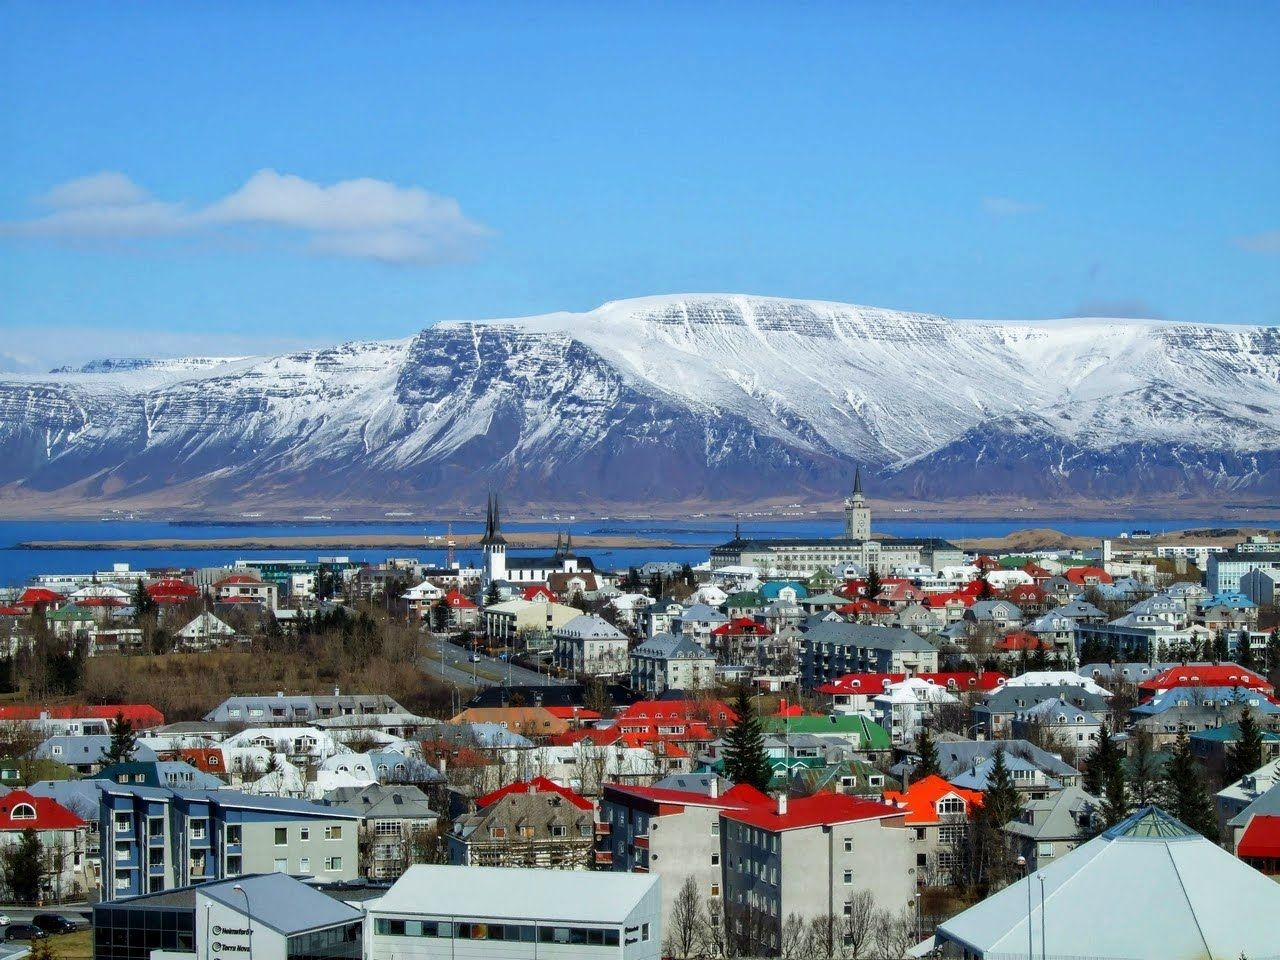 Reykjavik Is The Capital And Largest City In Iceland Its Latitude - Iceland latitude